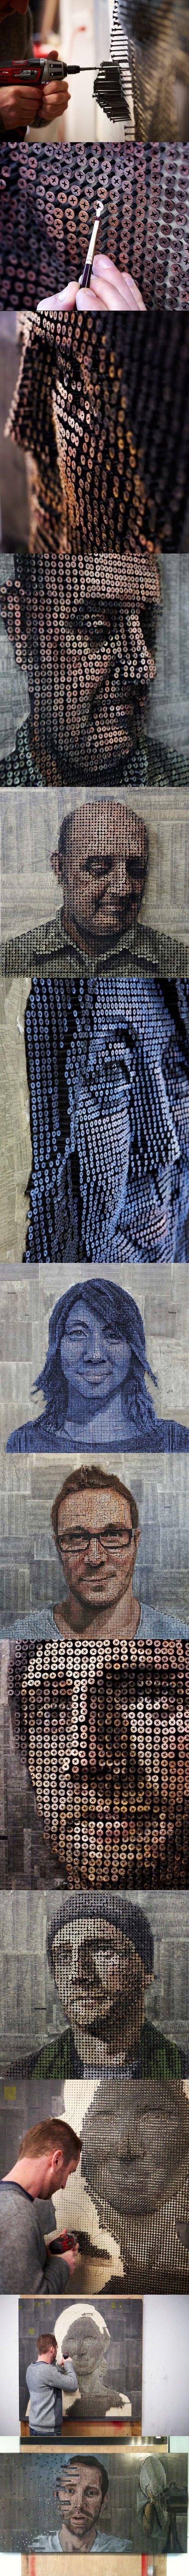 Andrew Myers 3D-Portraits aus Schrauben - Win Bilder - Webfail